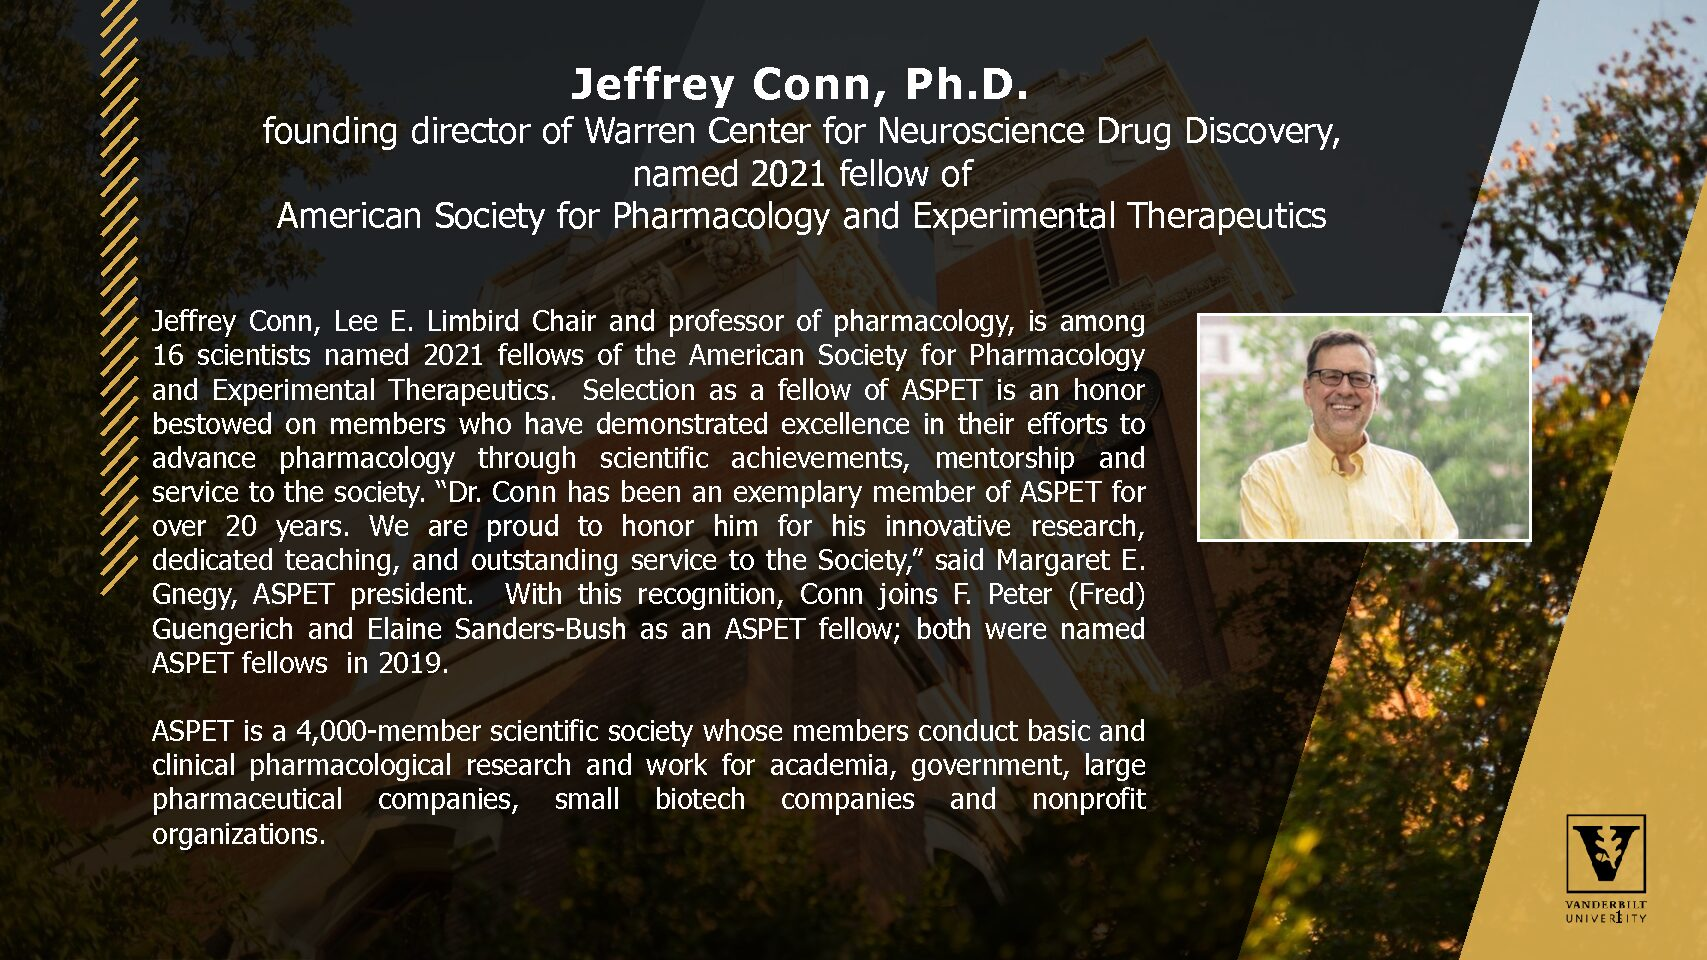 Jeffrey Conn, Ph.D. Named 2021 ASPET Fellow